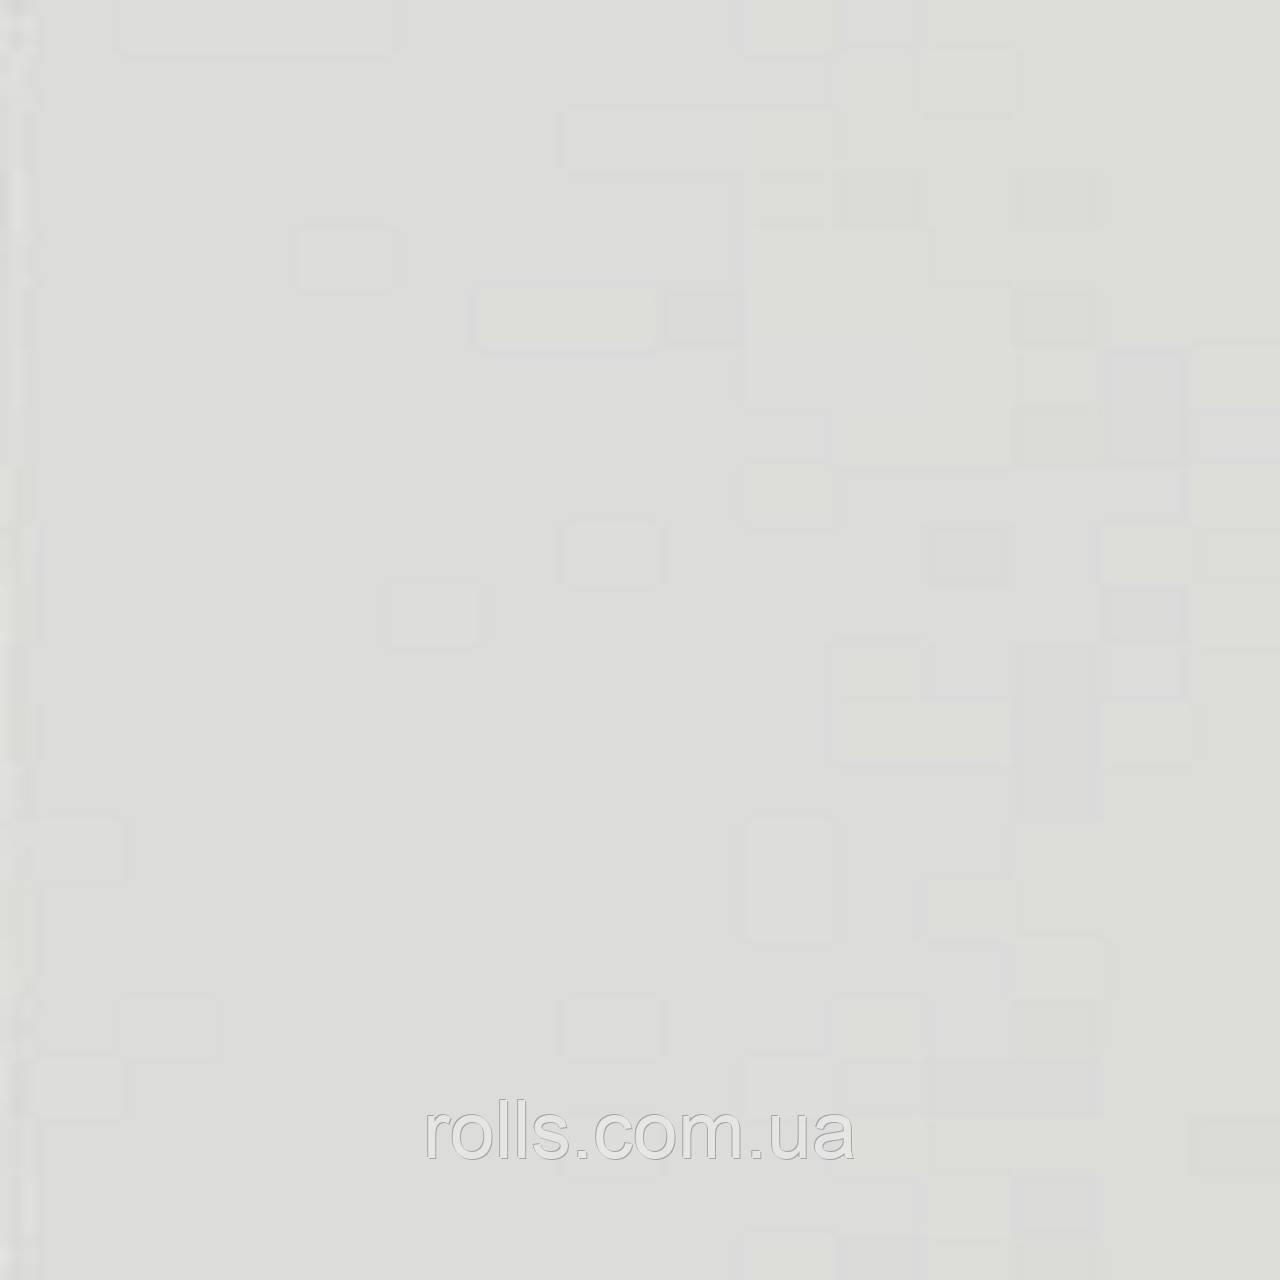 "Алюминиевый лист плоский Prefalz №13 NATURBLANK ""Неокрашенный алюминий"" ""PLAIN ALUMINIUM"" 0,7х1000х2000мм"